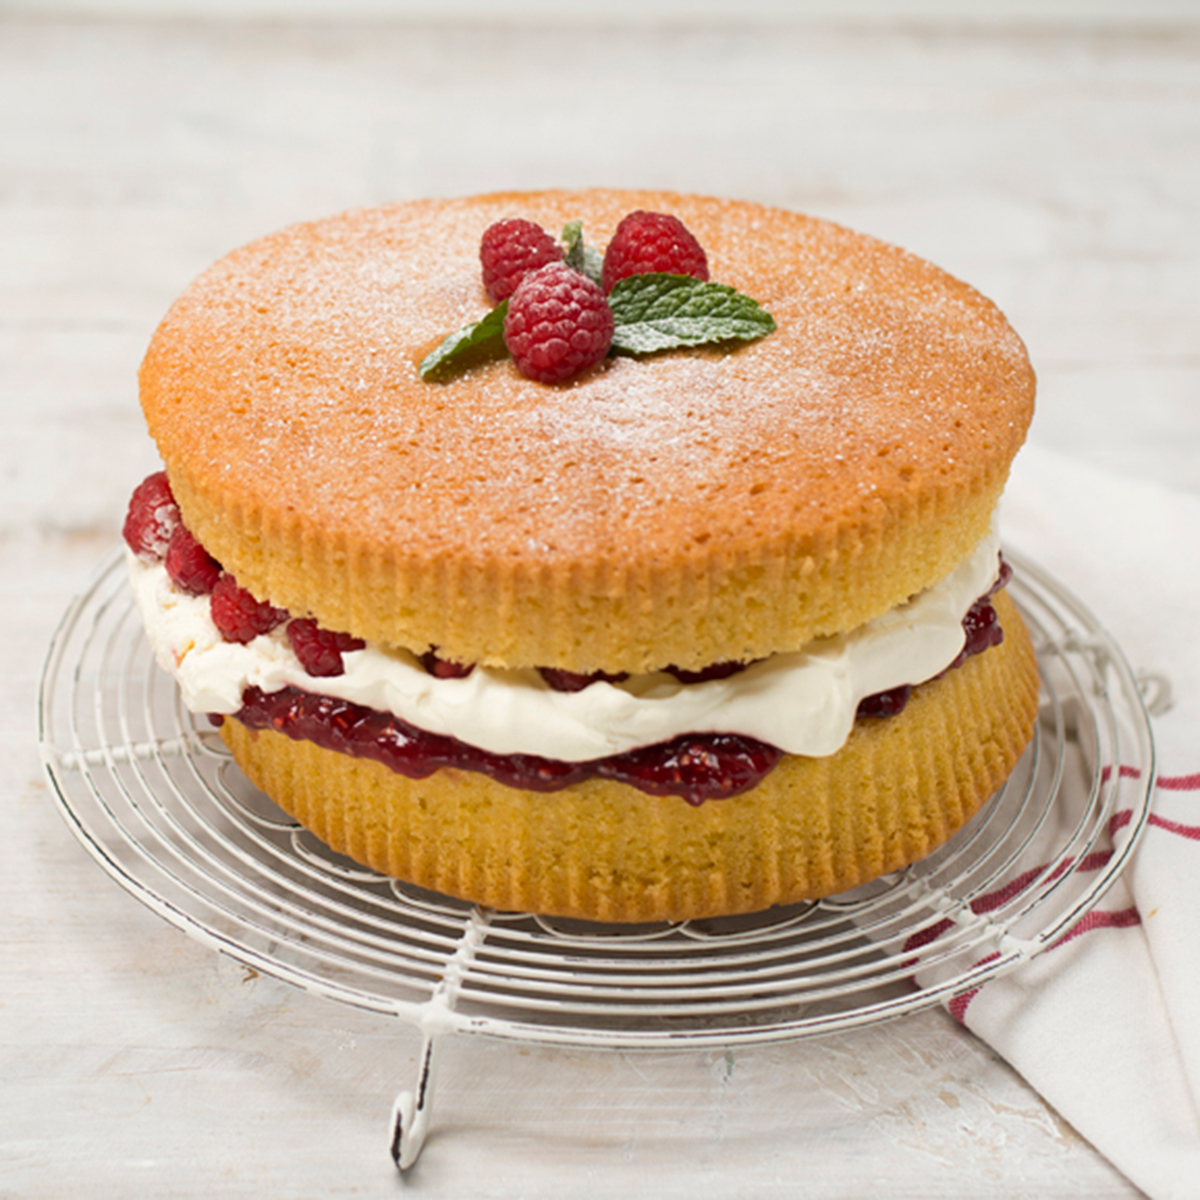 How To Make Sponge Cake With Self Raising Flour